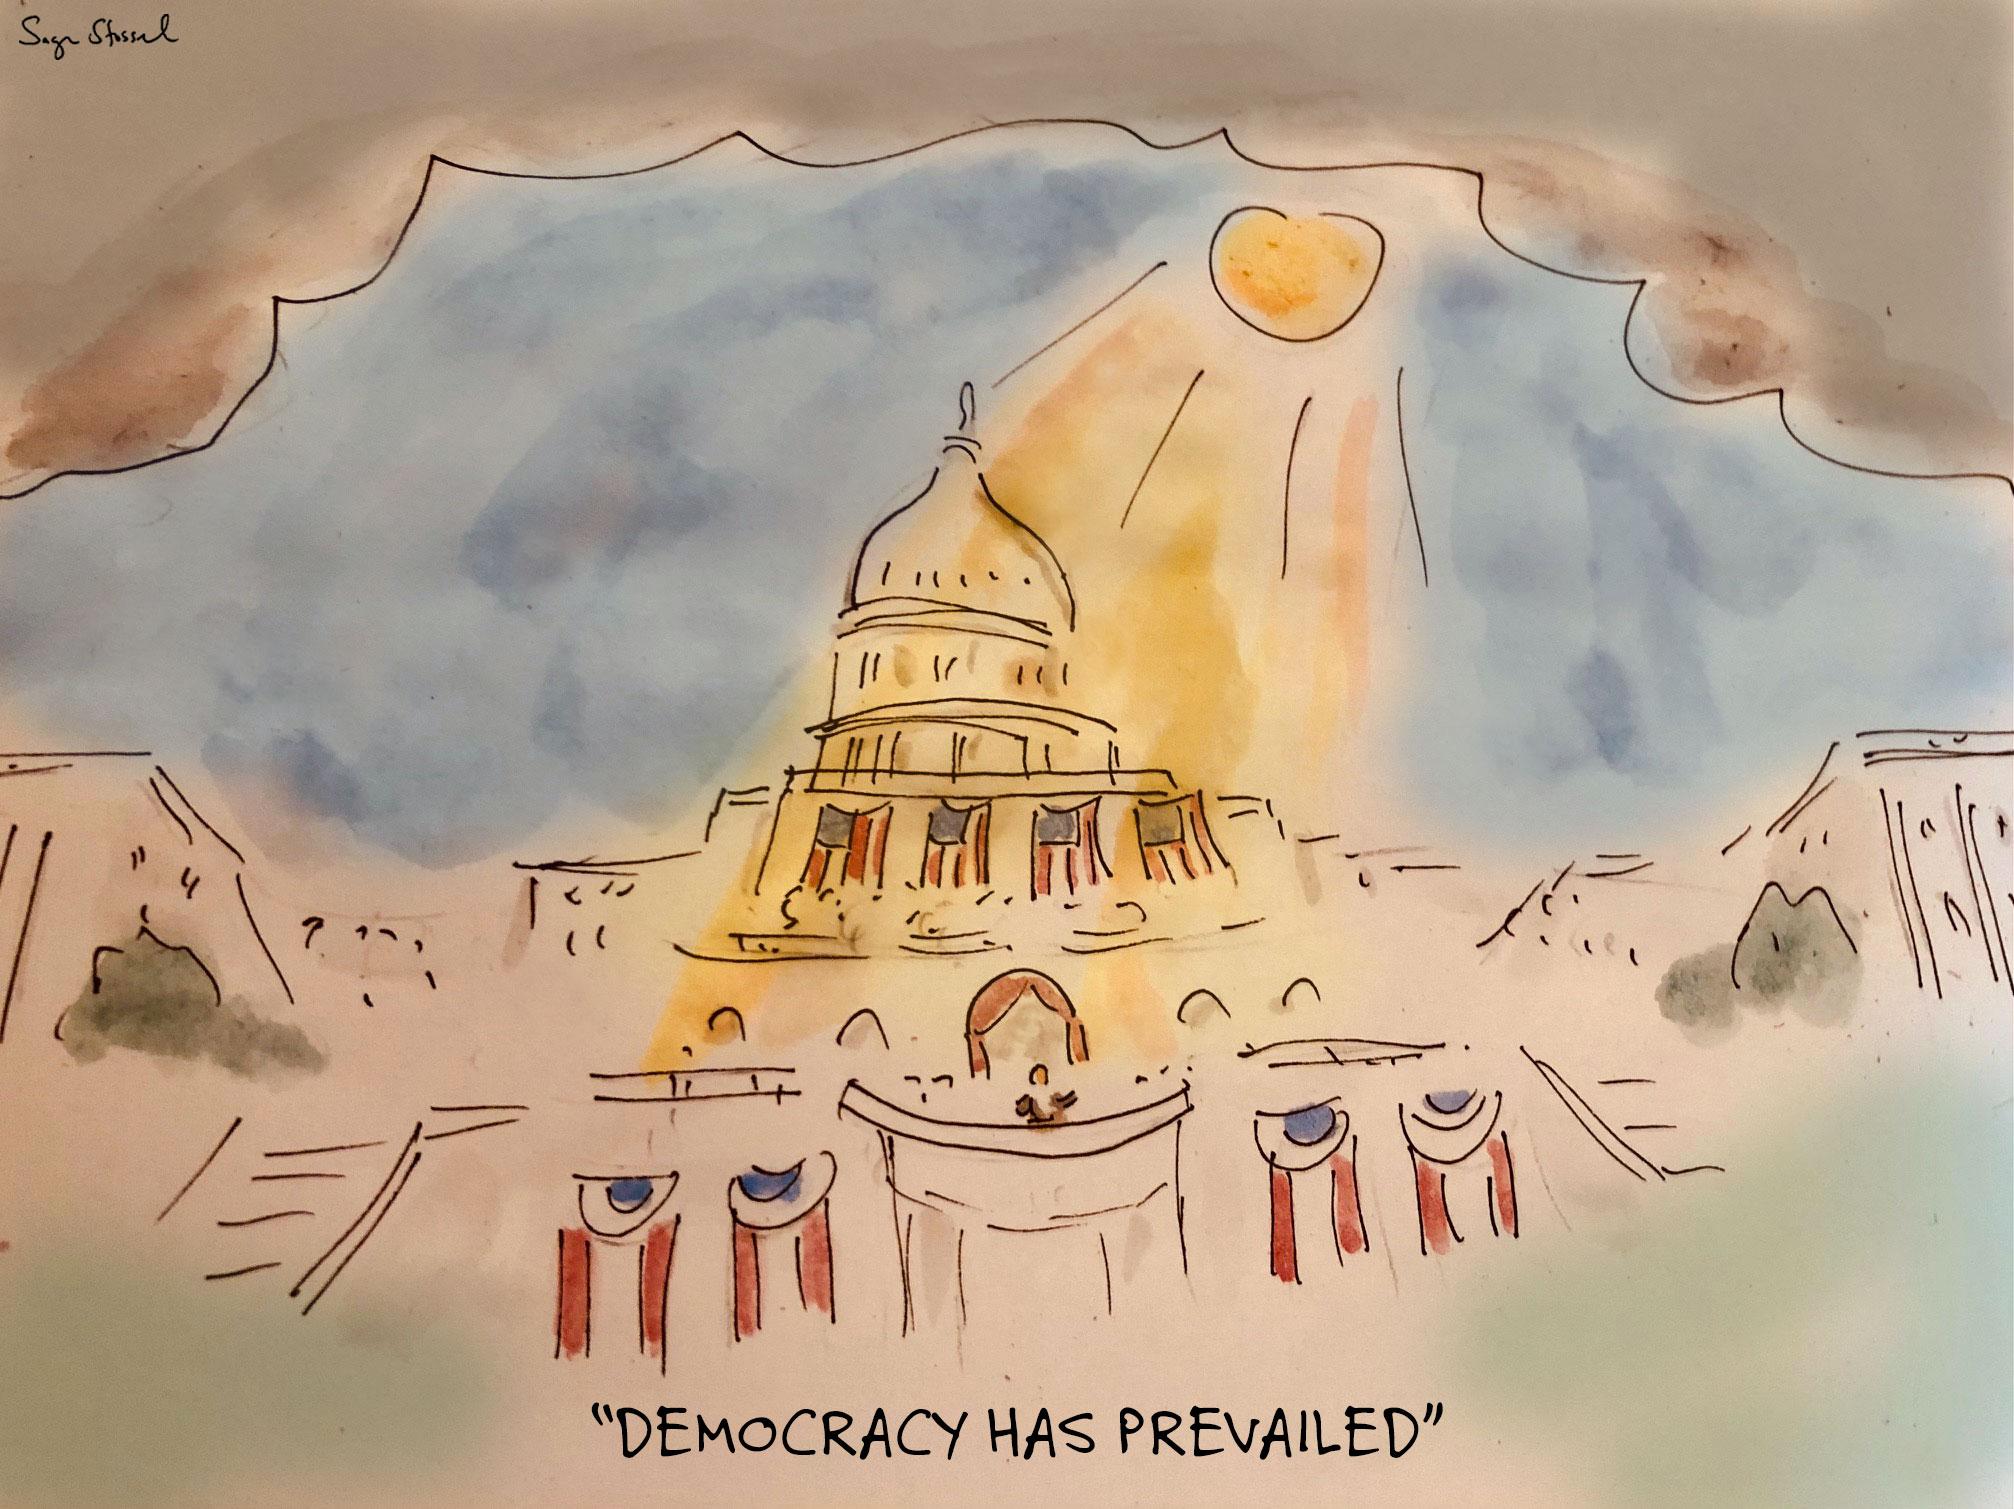 biden inauguration, democracy, america, trump, weather, cartoon, sage stossel